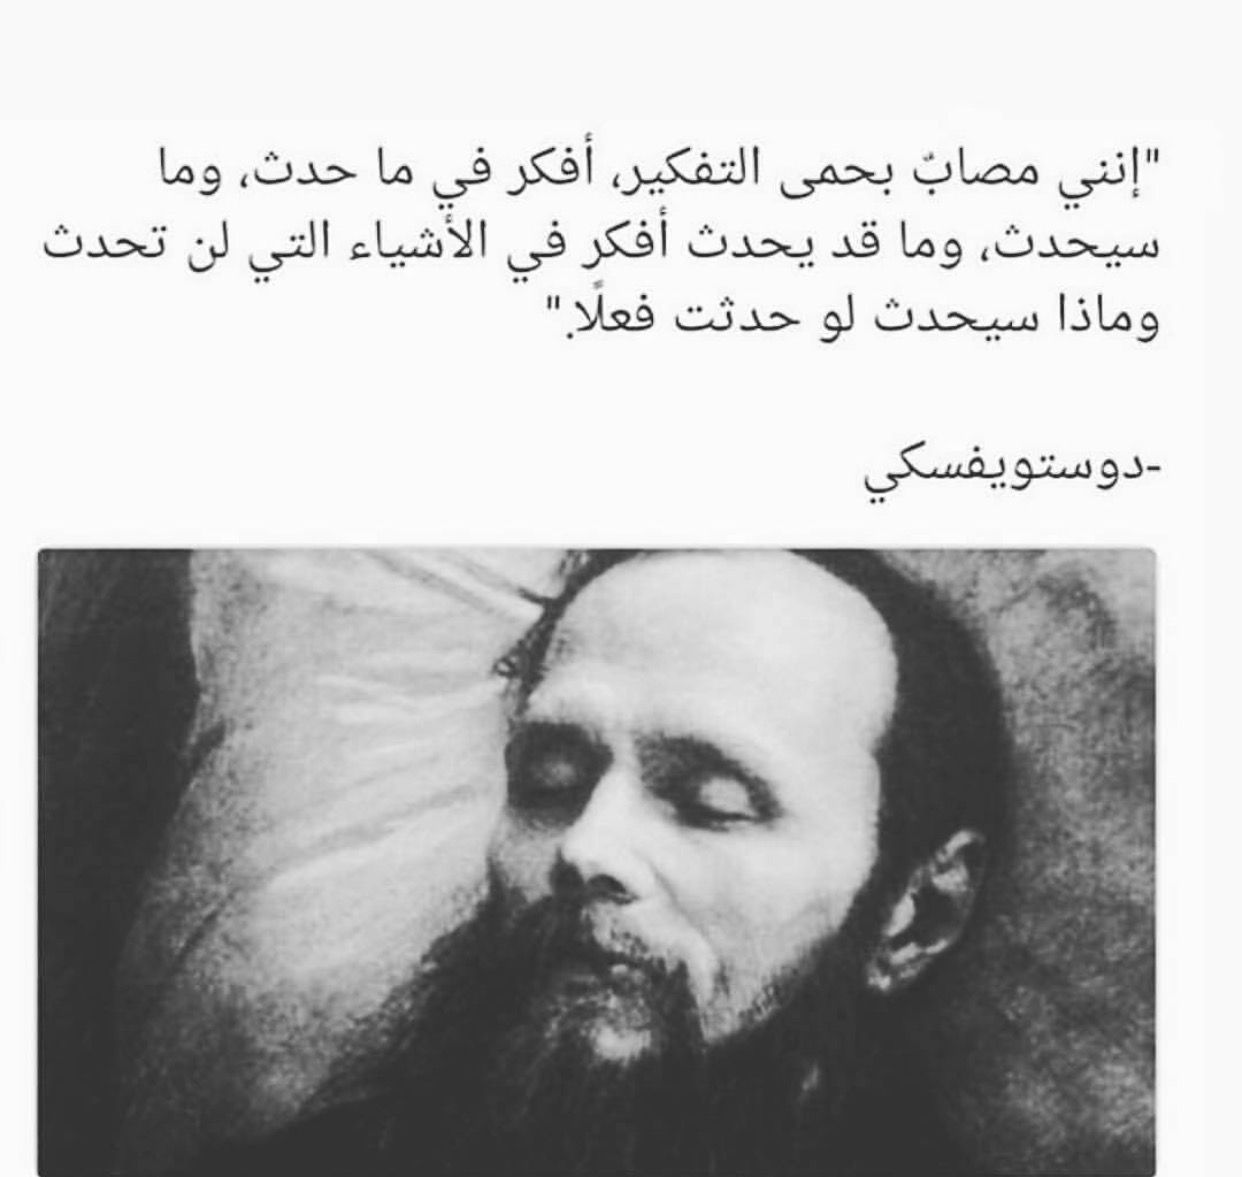 دوستويفسكي Quotes From Novels Arabic Quotes Photo Quotes